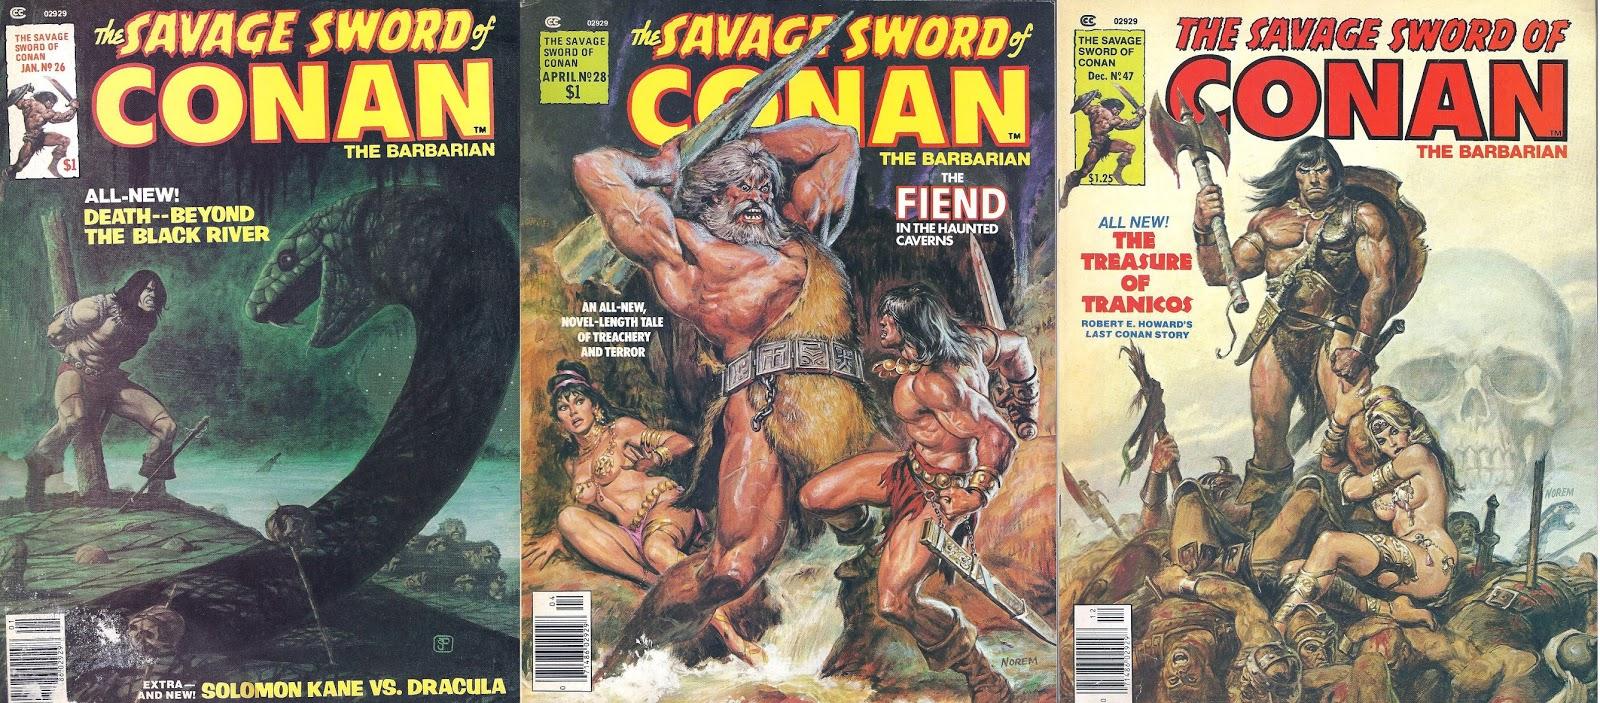 Robert E Howard - Conan : L'intégrale 8 volumes